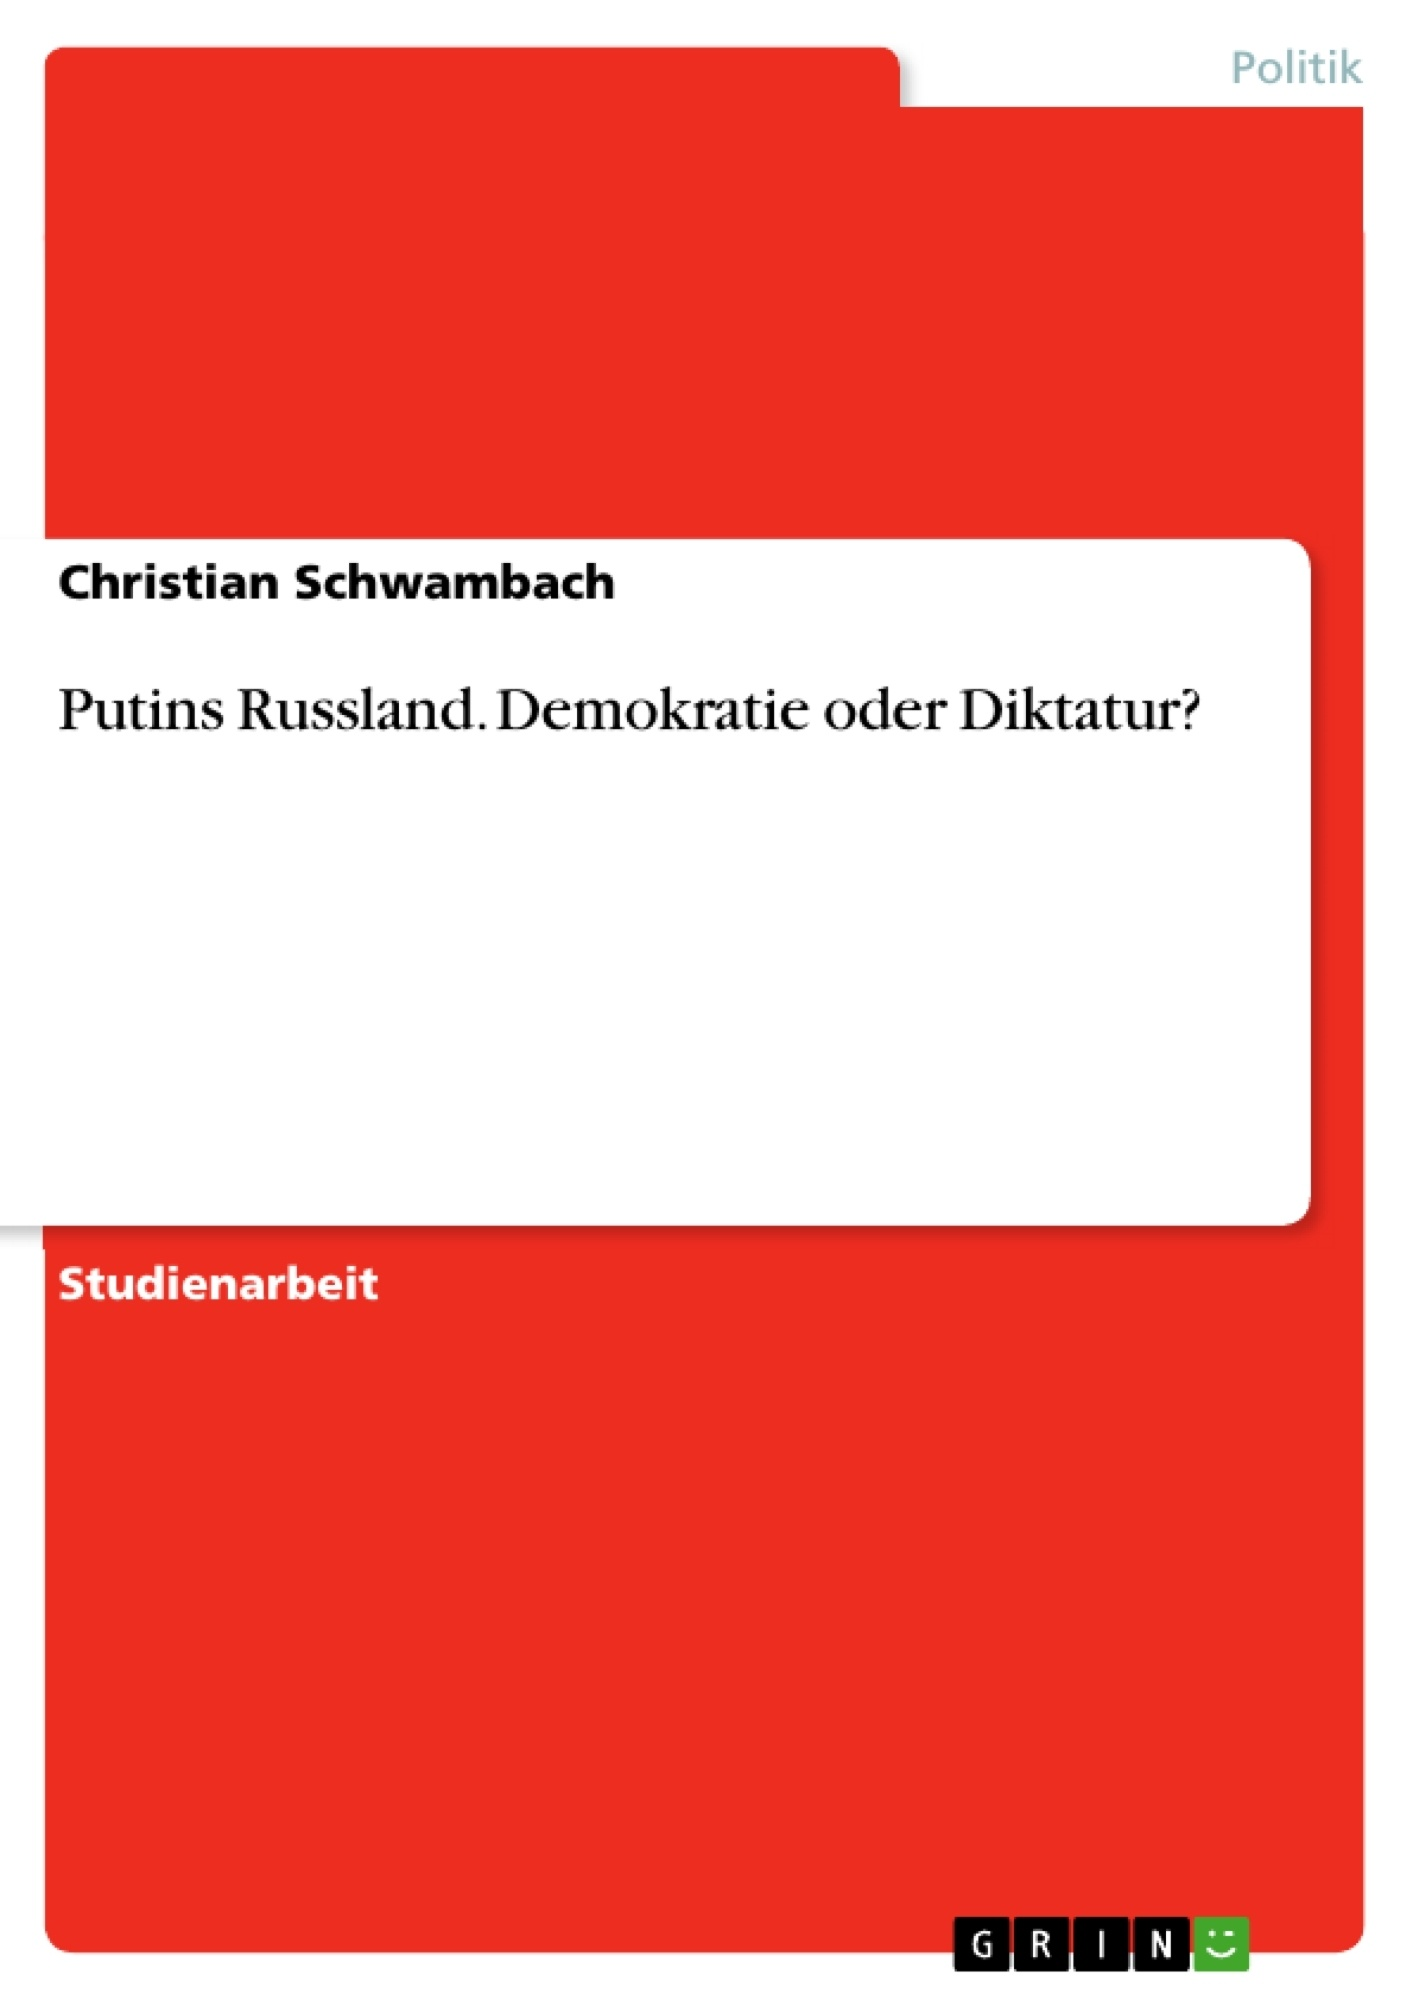 Titel: Putins Russland. Demokratie oder Diktatur?